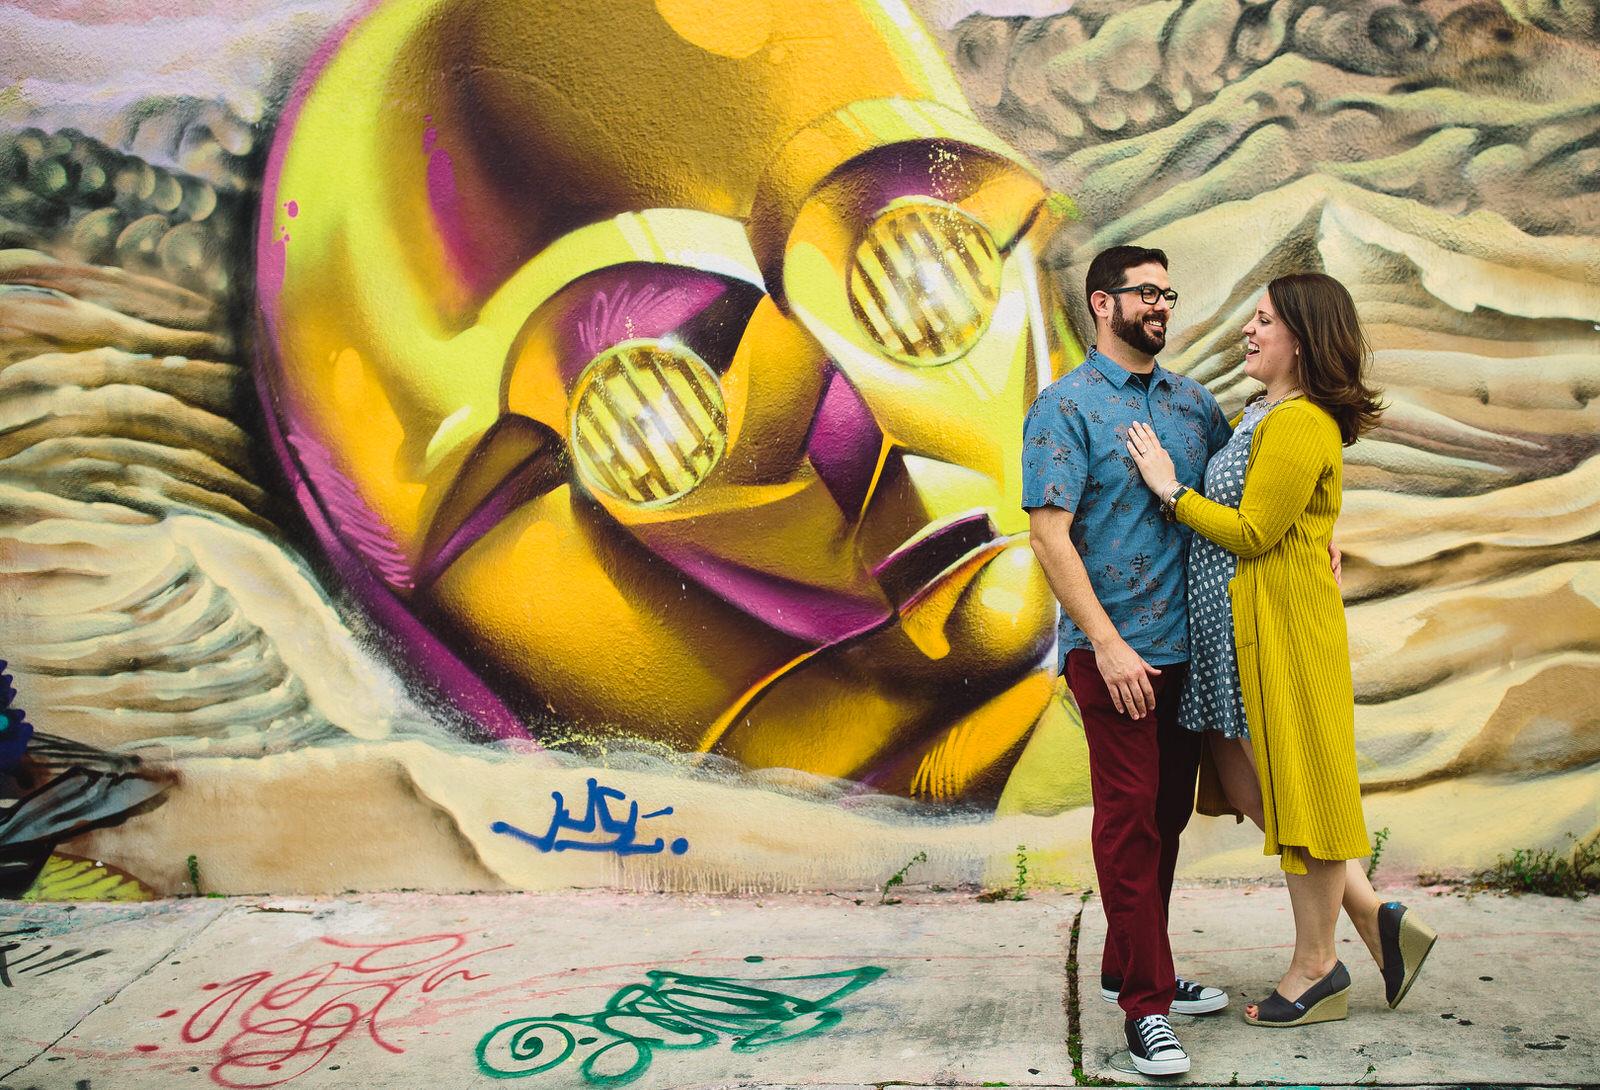 graffiti-engagement-session-lula-roe-16.jpg